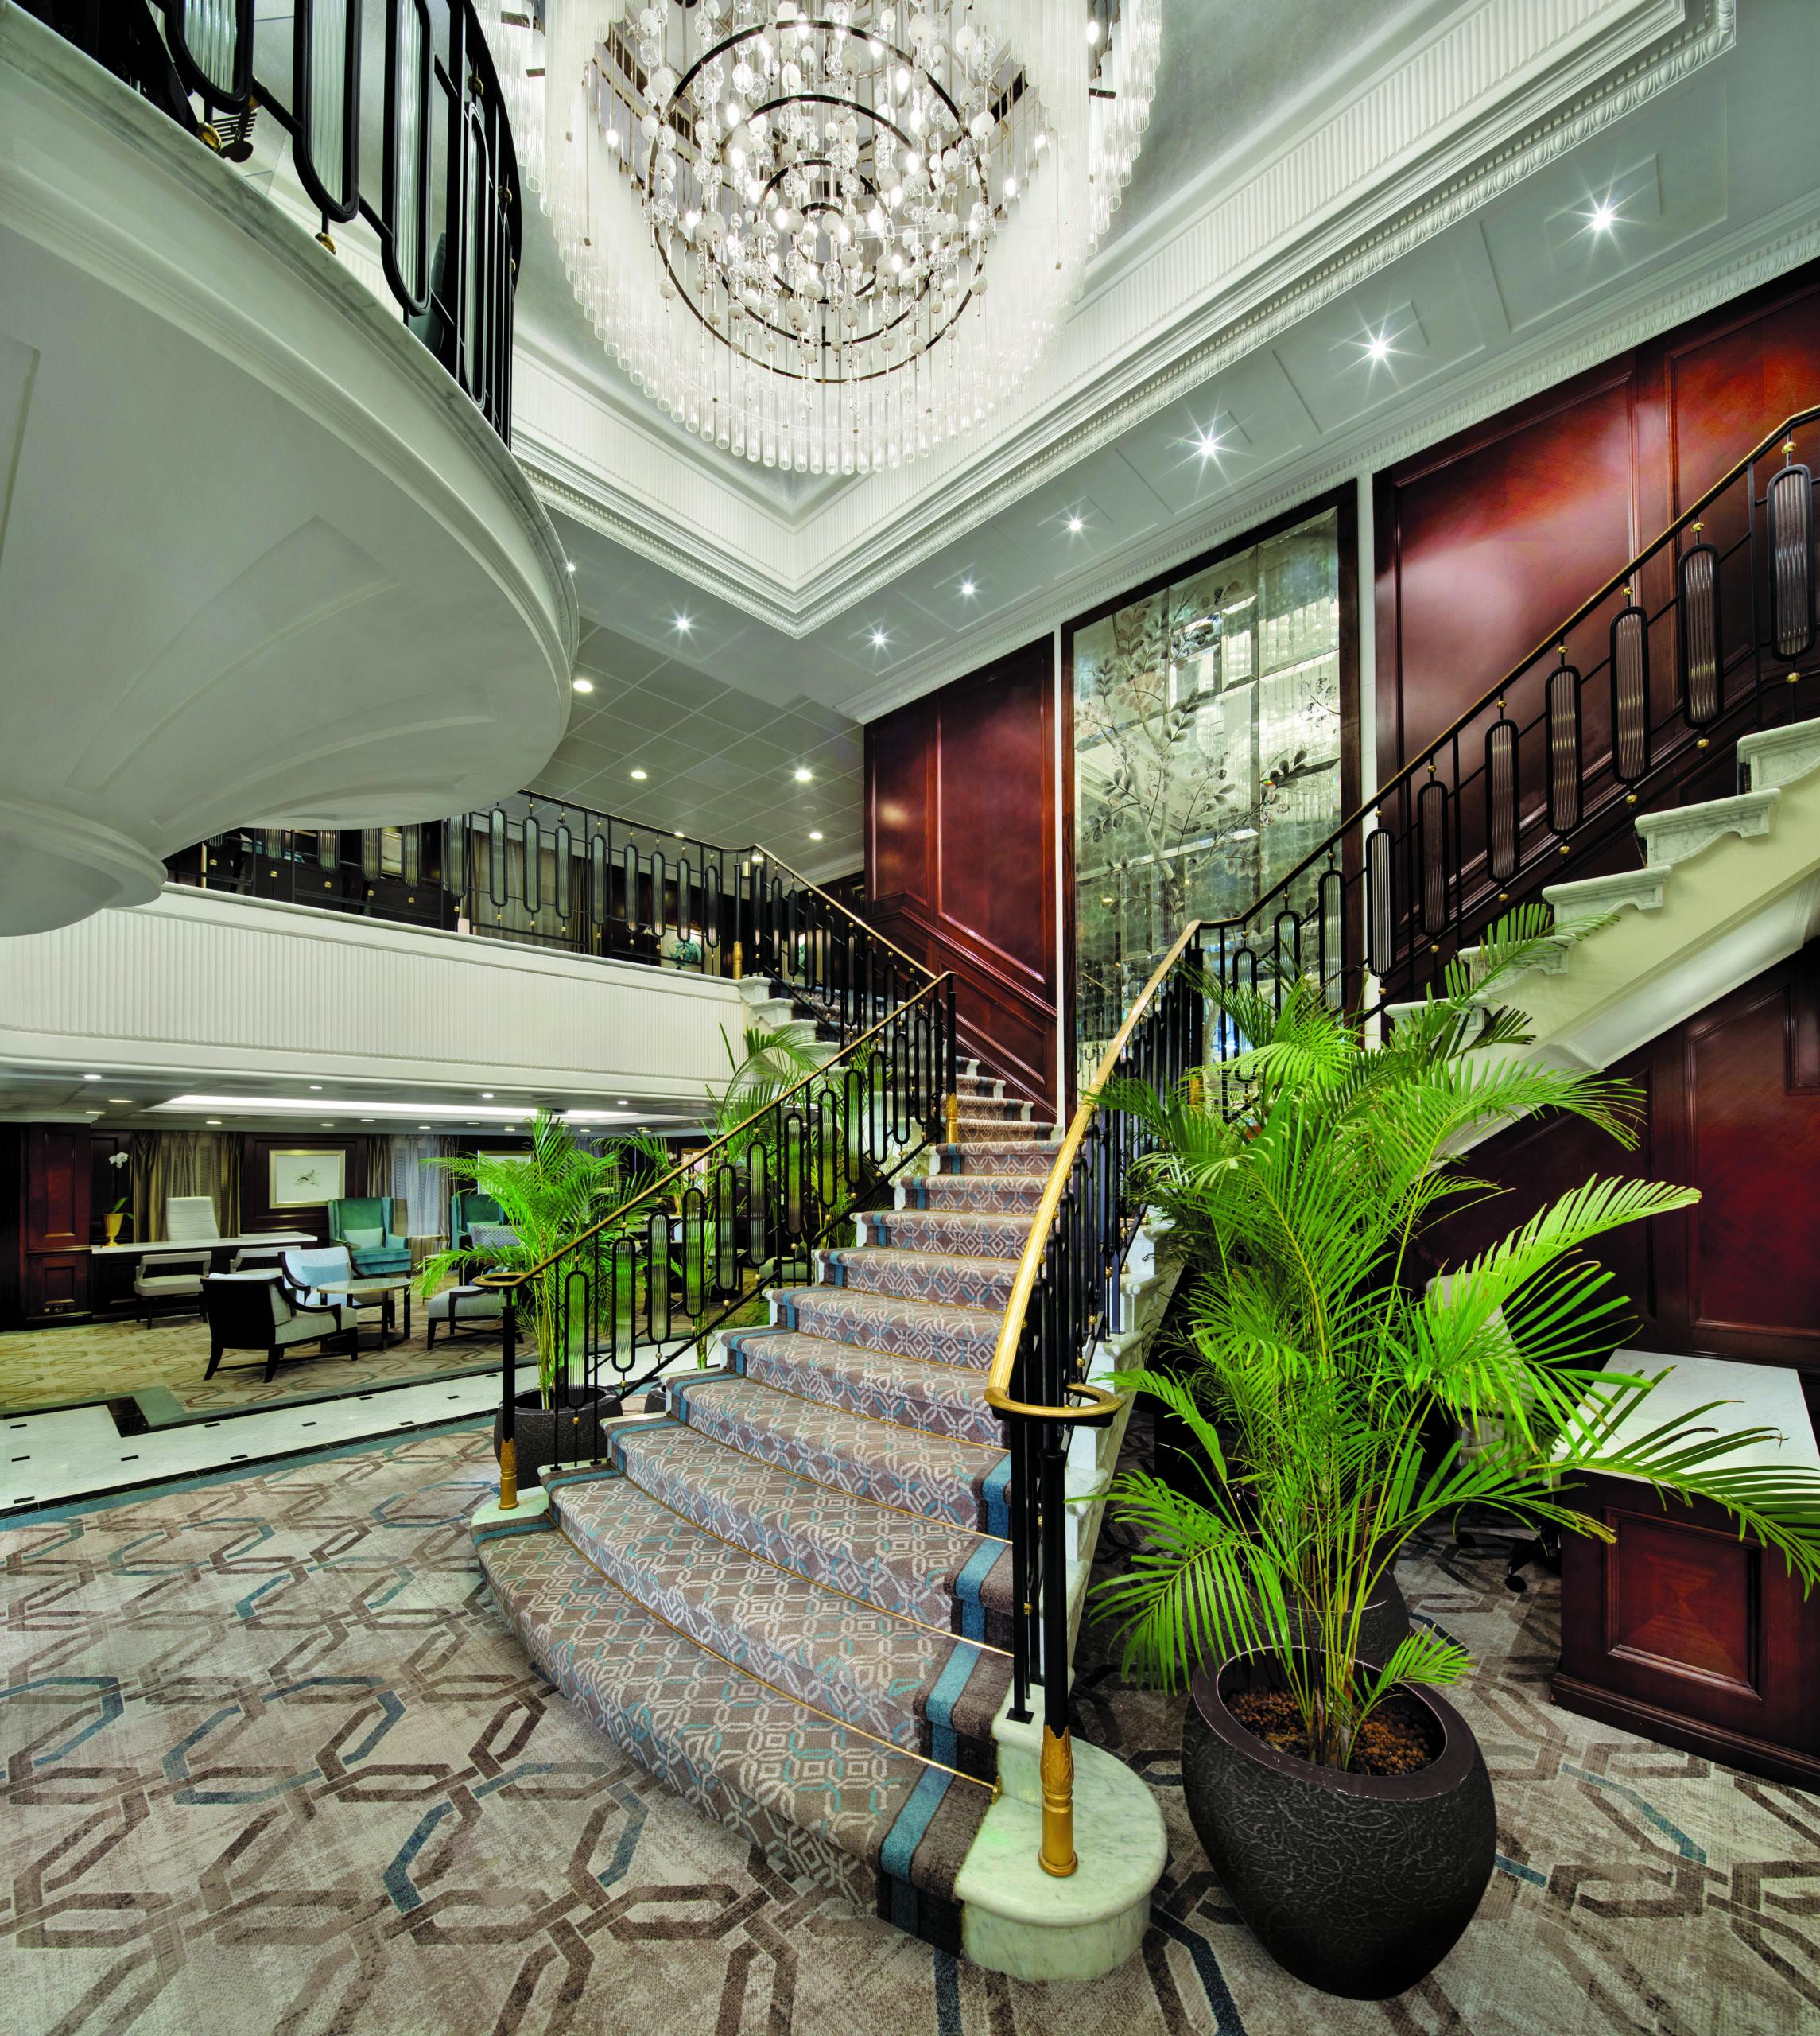 Oceania Cruises Insignia Grand Staircaise Cruiseschip Cruise